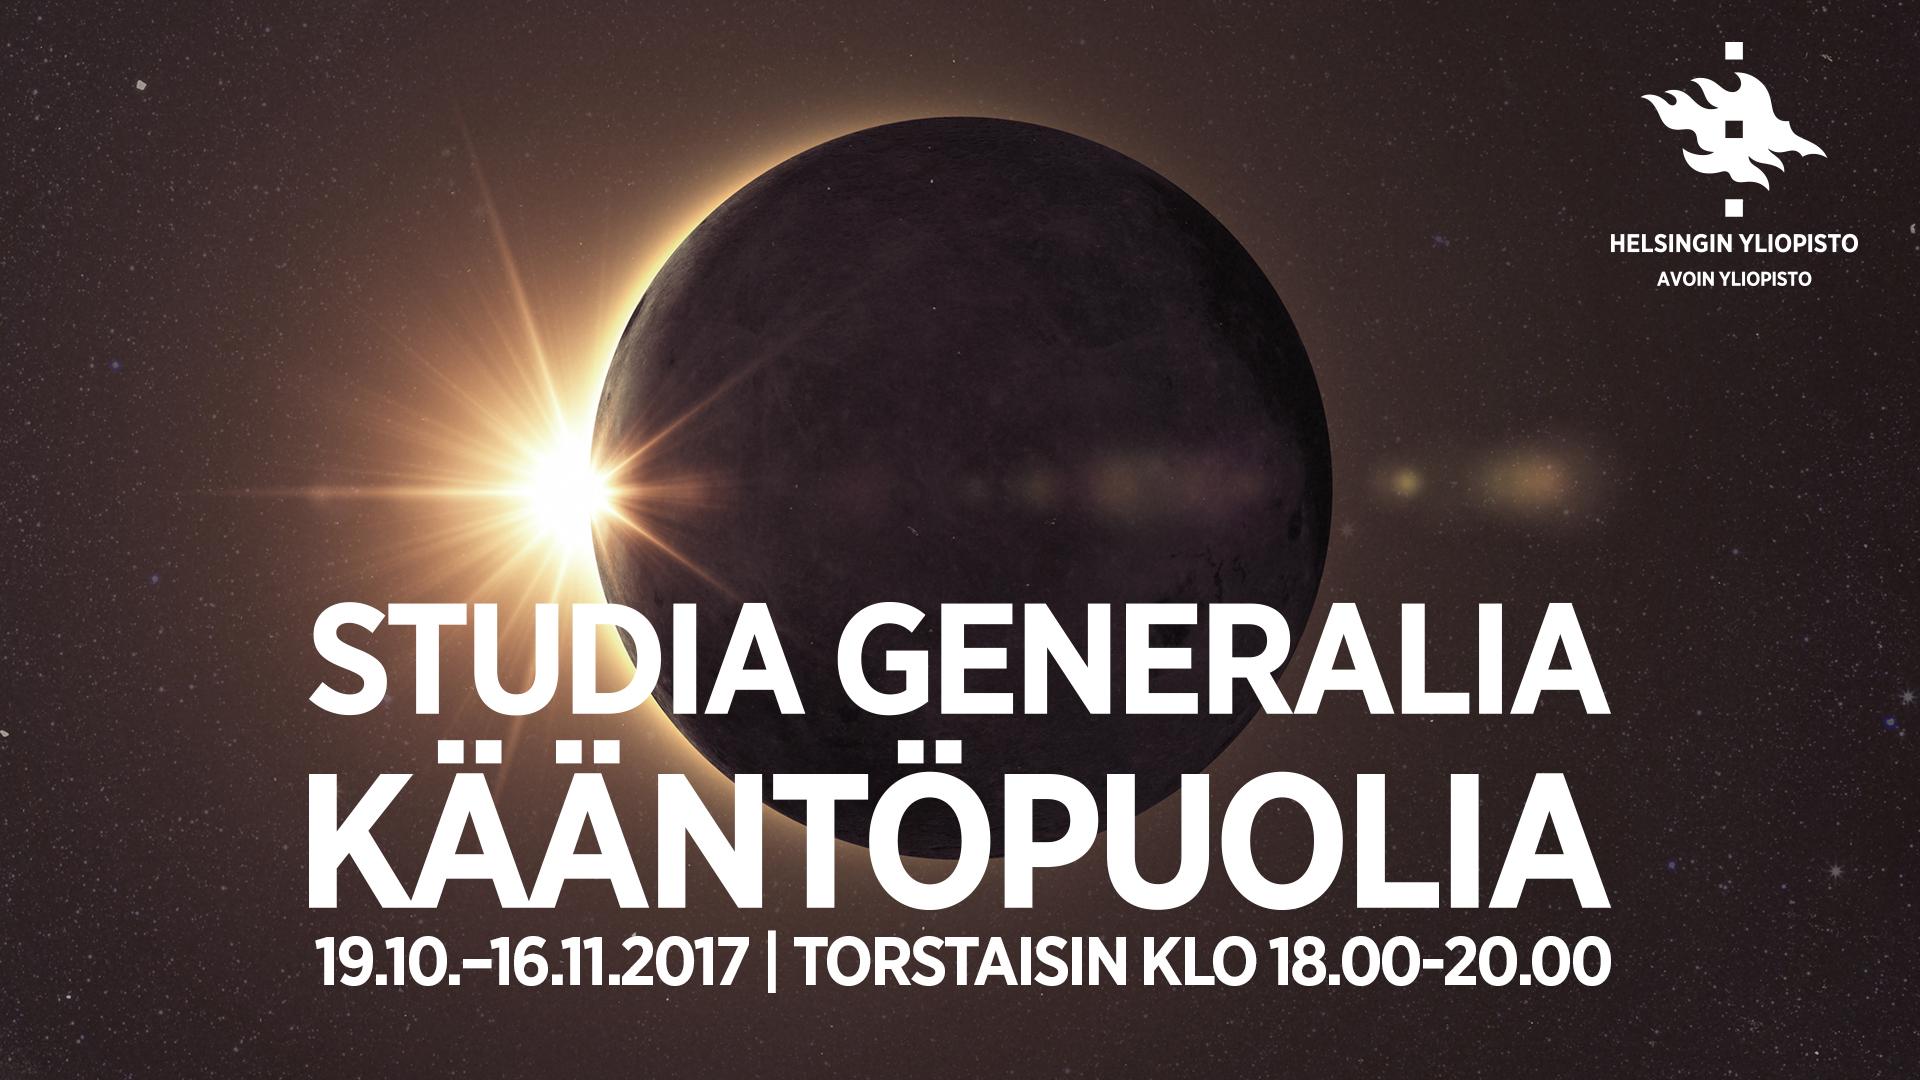 Studia Generalia Kääntöpuolia: Keko ja kerrostalo